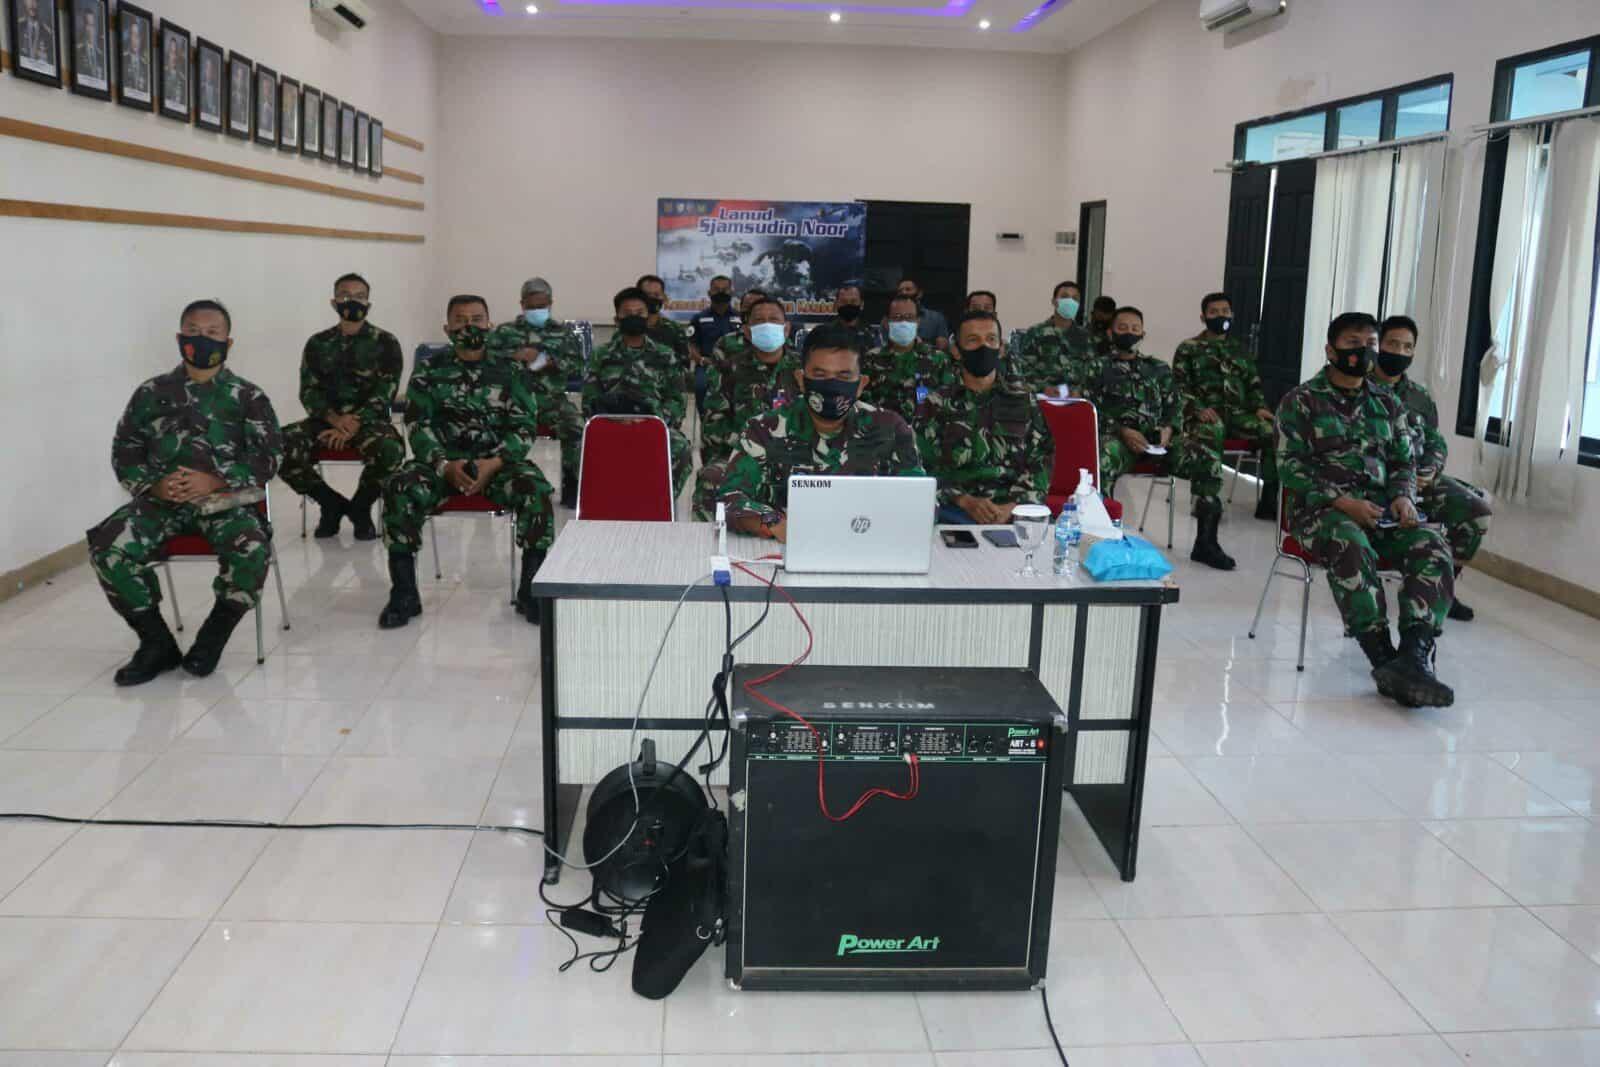 Komandan Beserta Seluruh Perwira Lanud Sjamsudin Noor Ikuti Vicon Tentang Kesiapan Satuan Jajaran TNI AU Dalam Rangka Mengantisipasi Demo Terkait UU Cipta Kerja